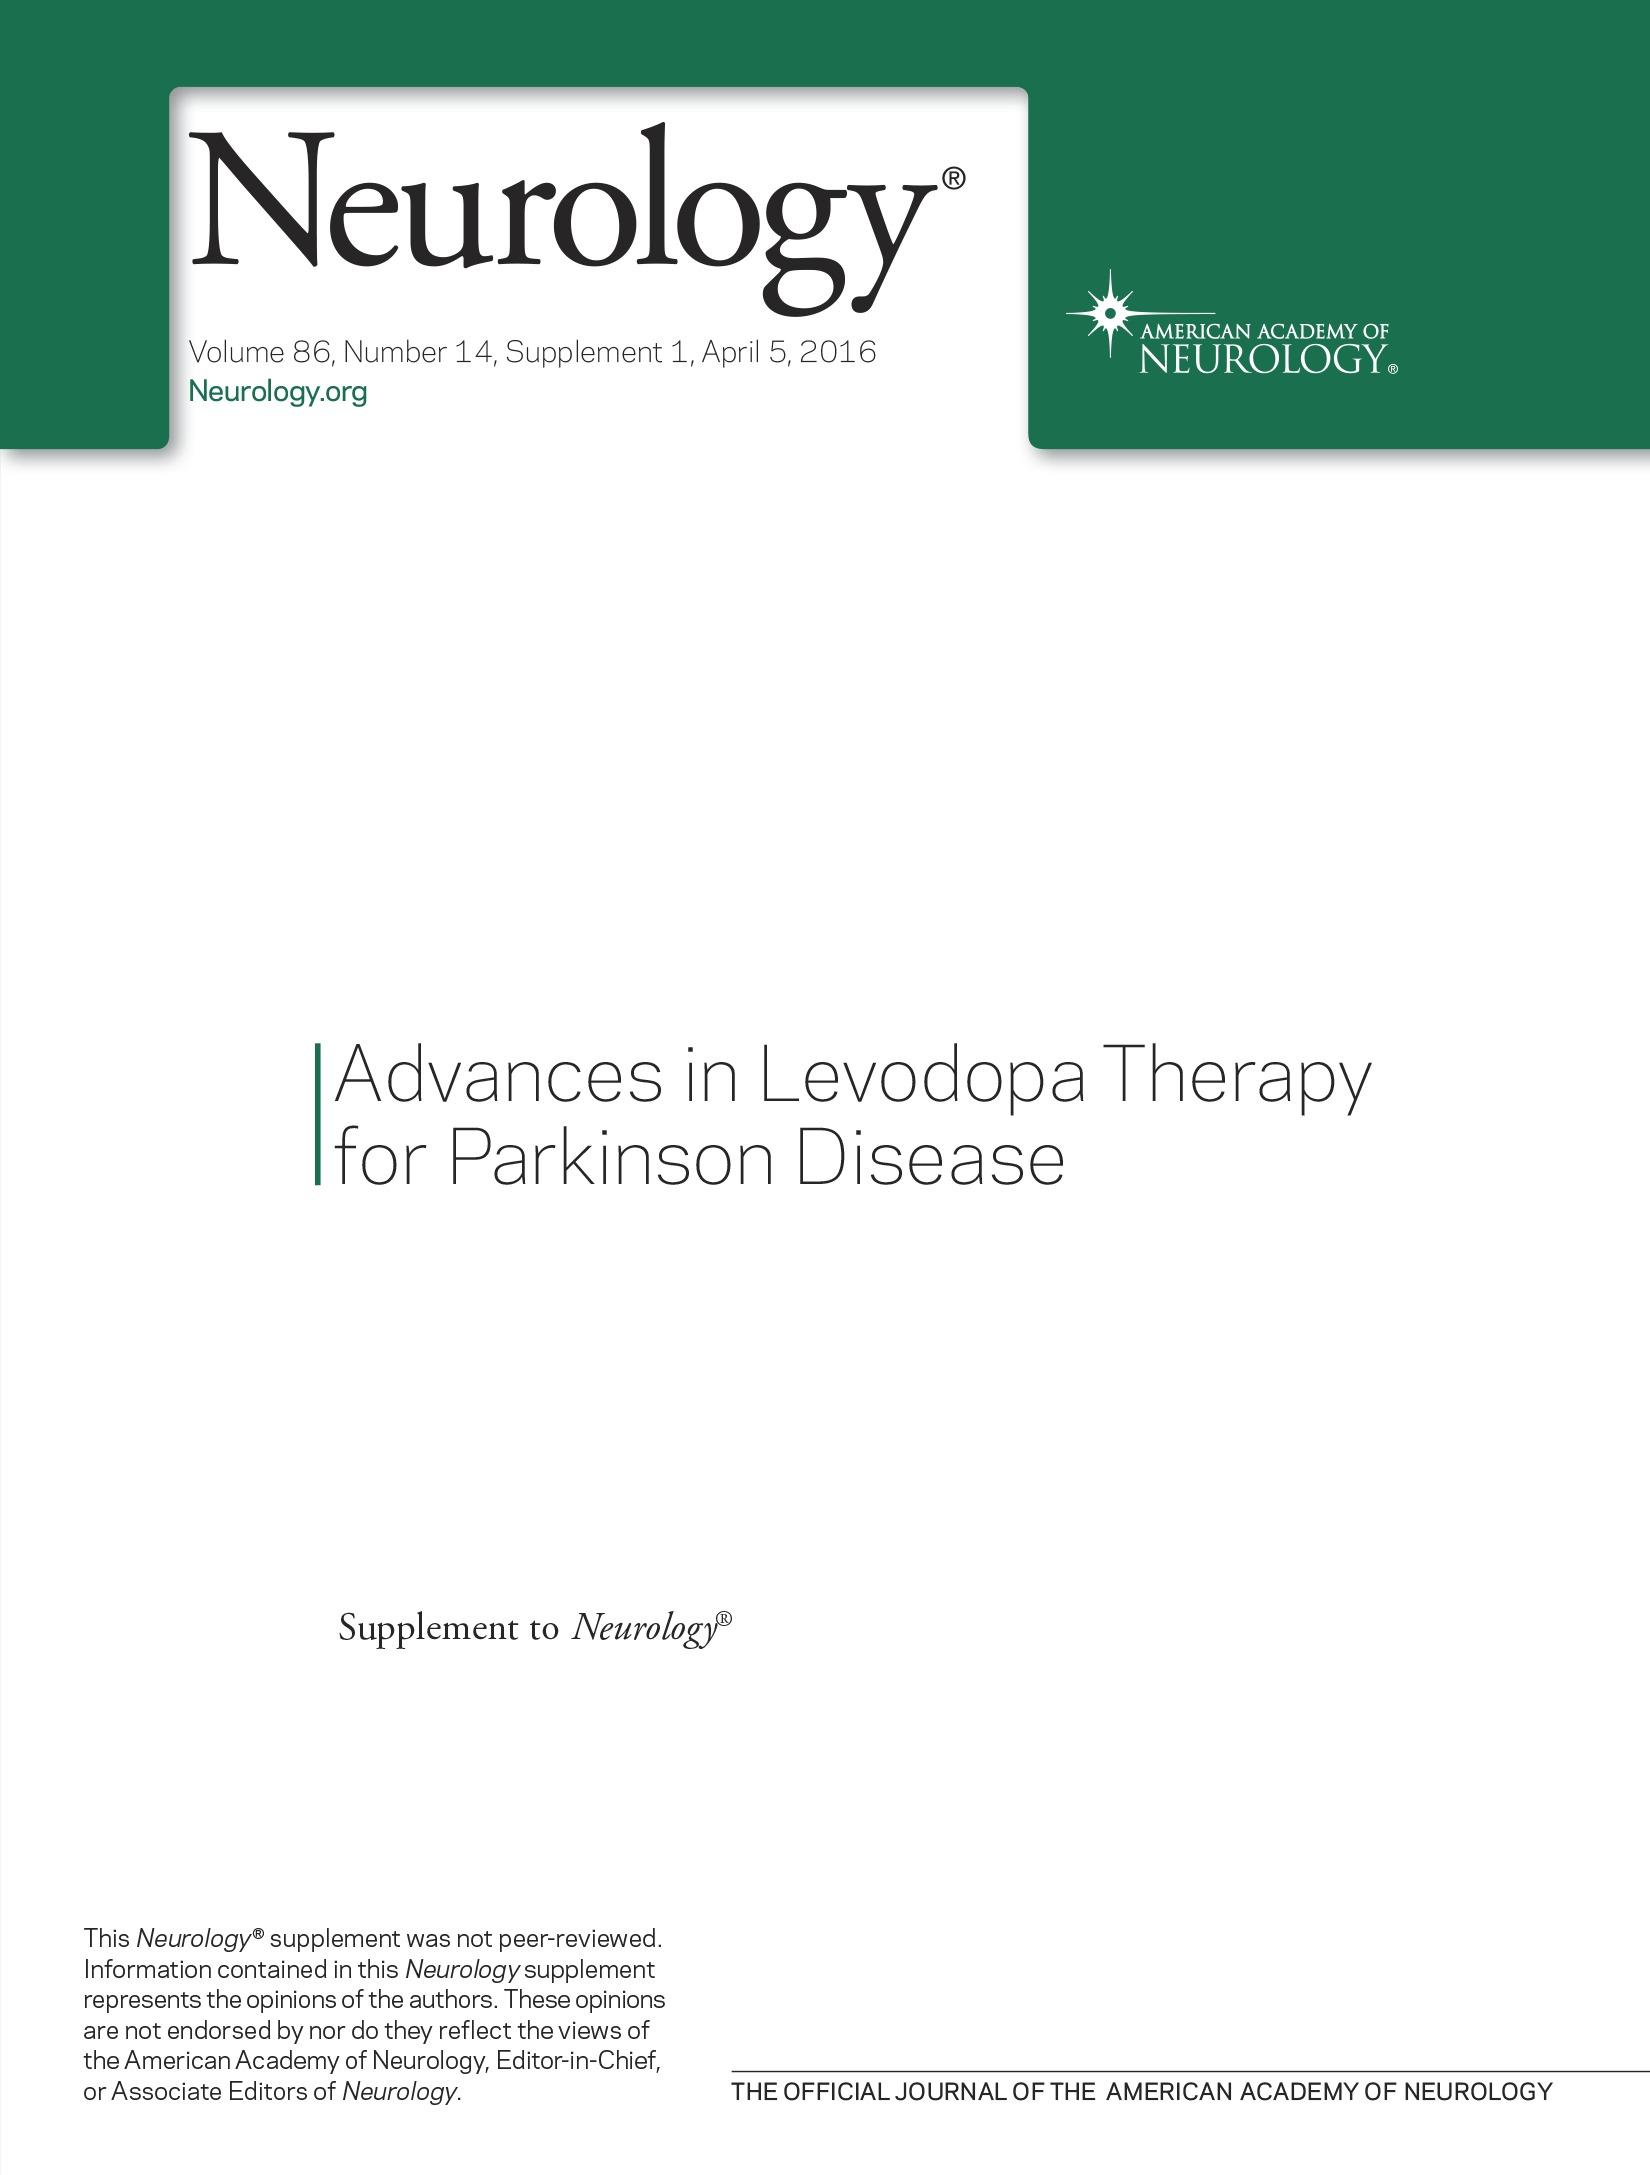 Levodopa therapy for Parkinson disease | Neurology